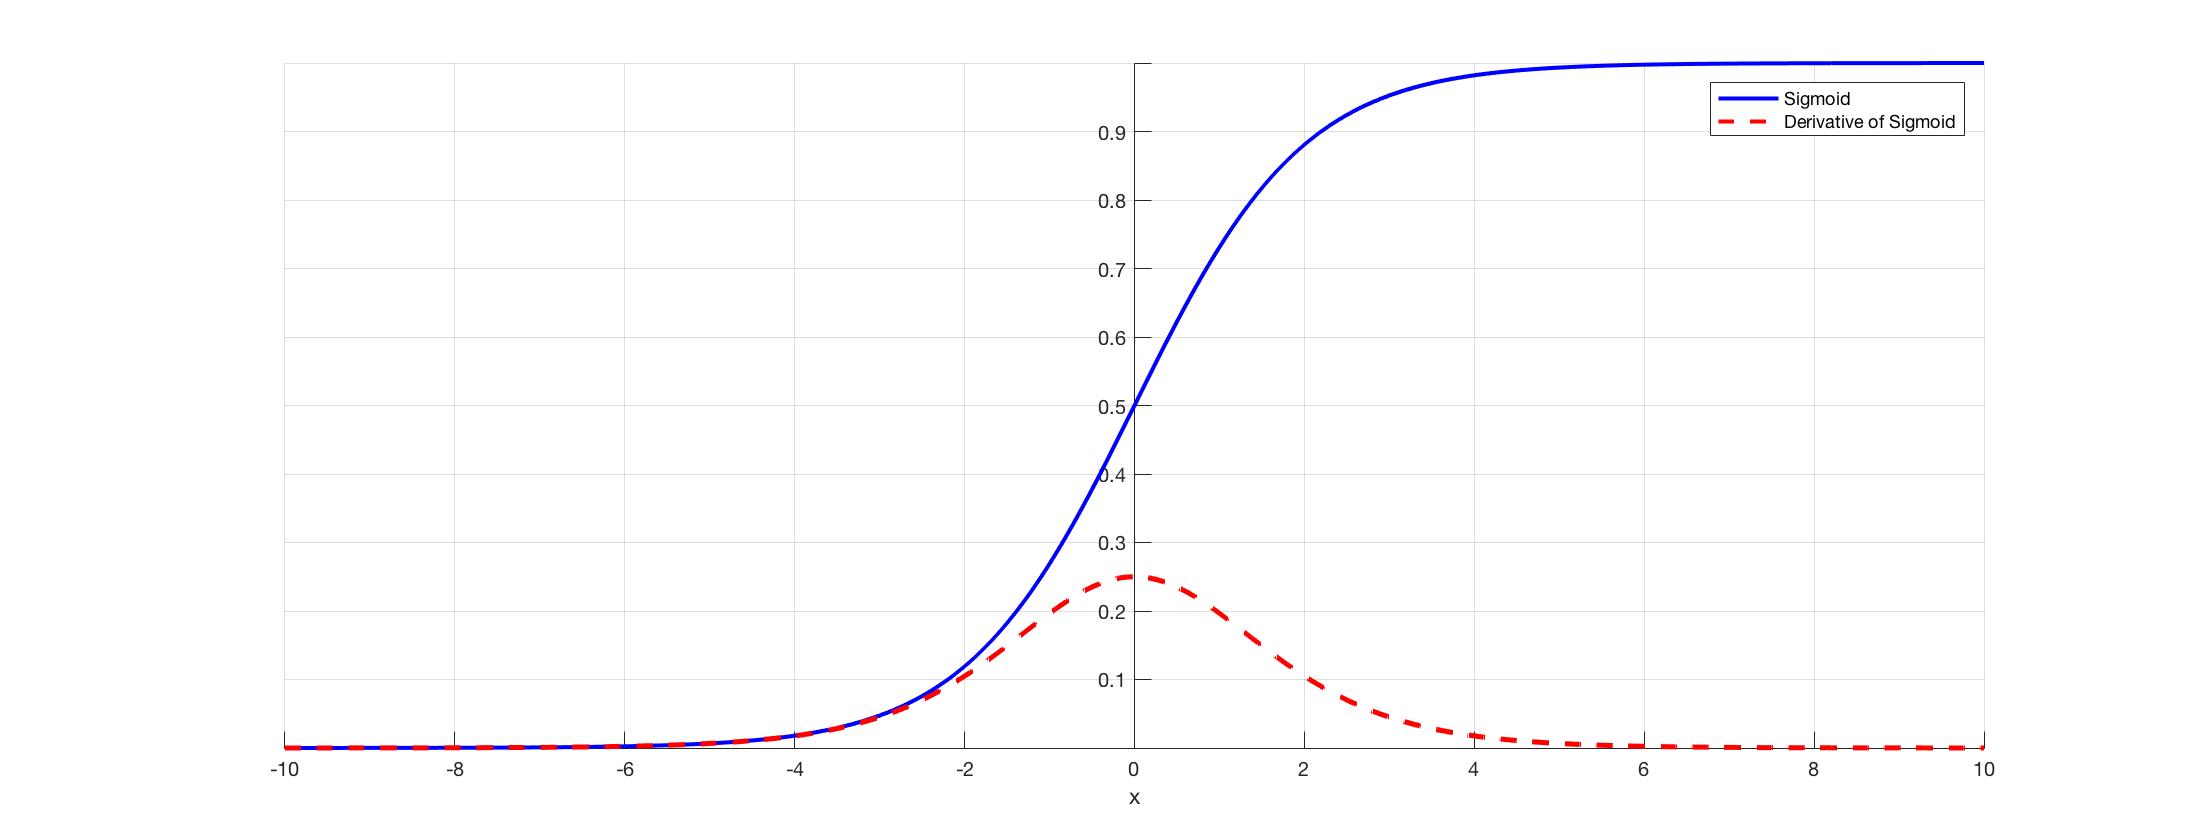 vanishing gradient problem Resnet-34